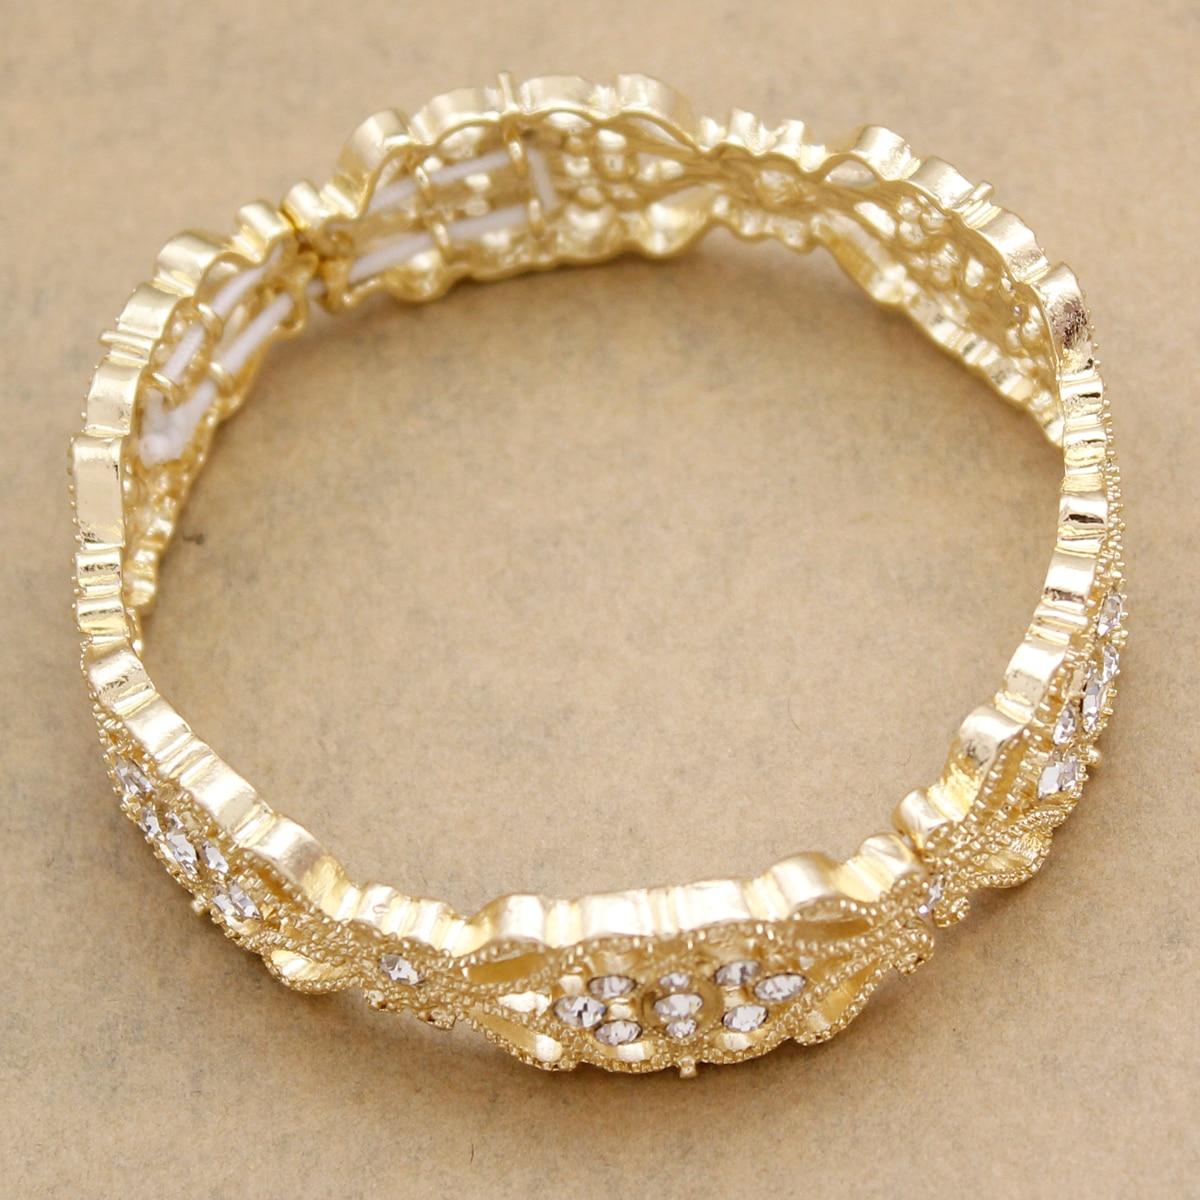 Art Deco 1920s Accessory Flapper Costume Flower Austria Crystal Bridal Cuff Silver Bracelet Bangle Gift Girl Jewelry